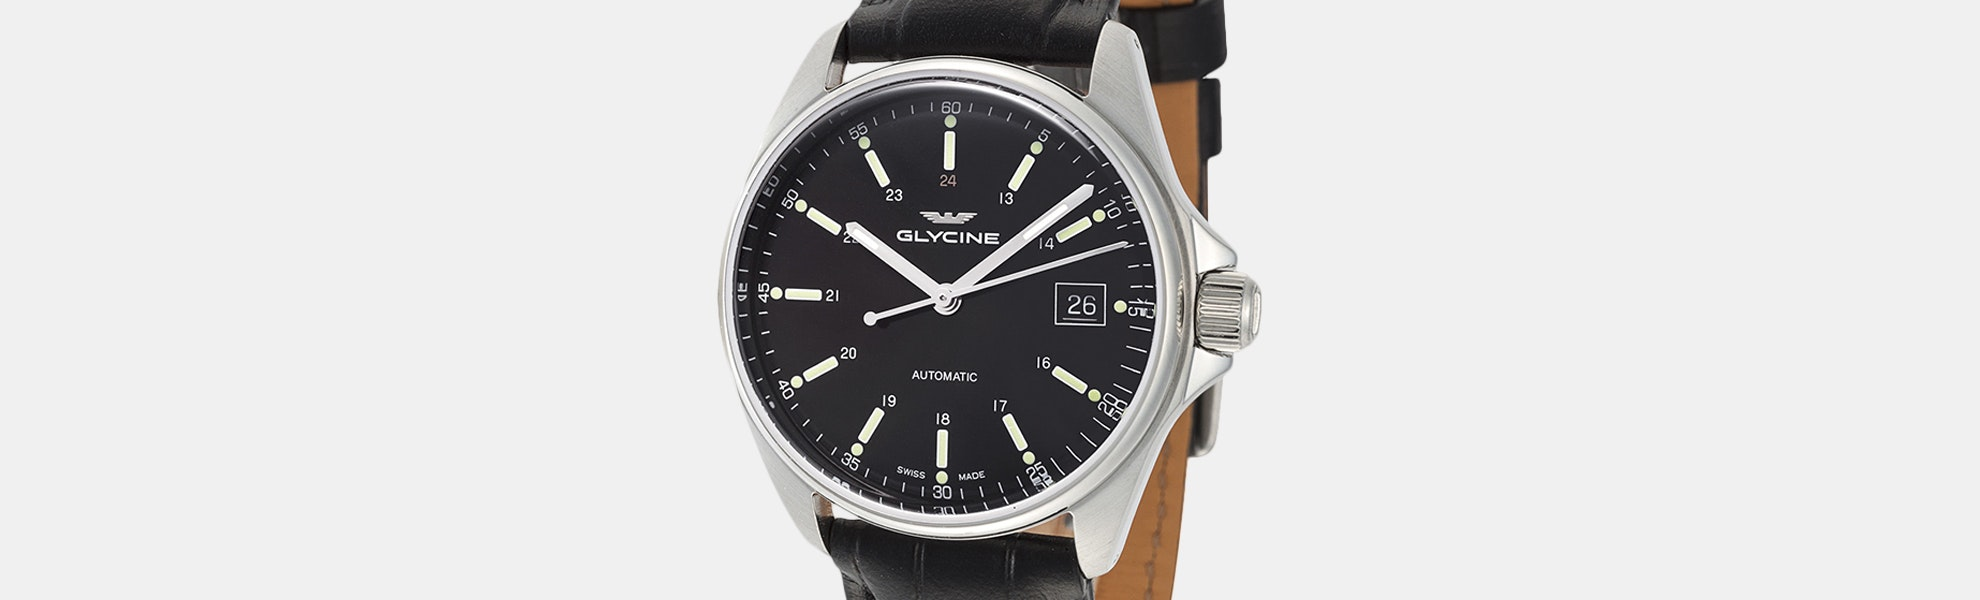 Glycine Combat 6 Classic Automatic Watch–Flash Sale